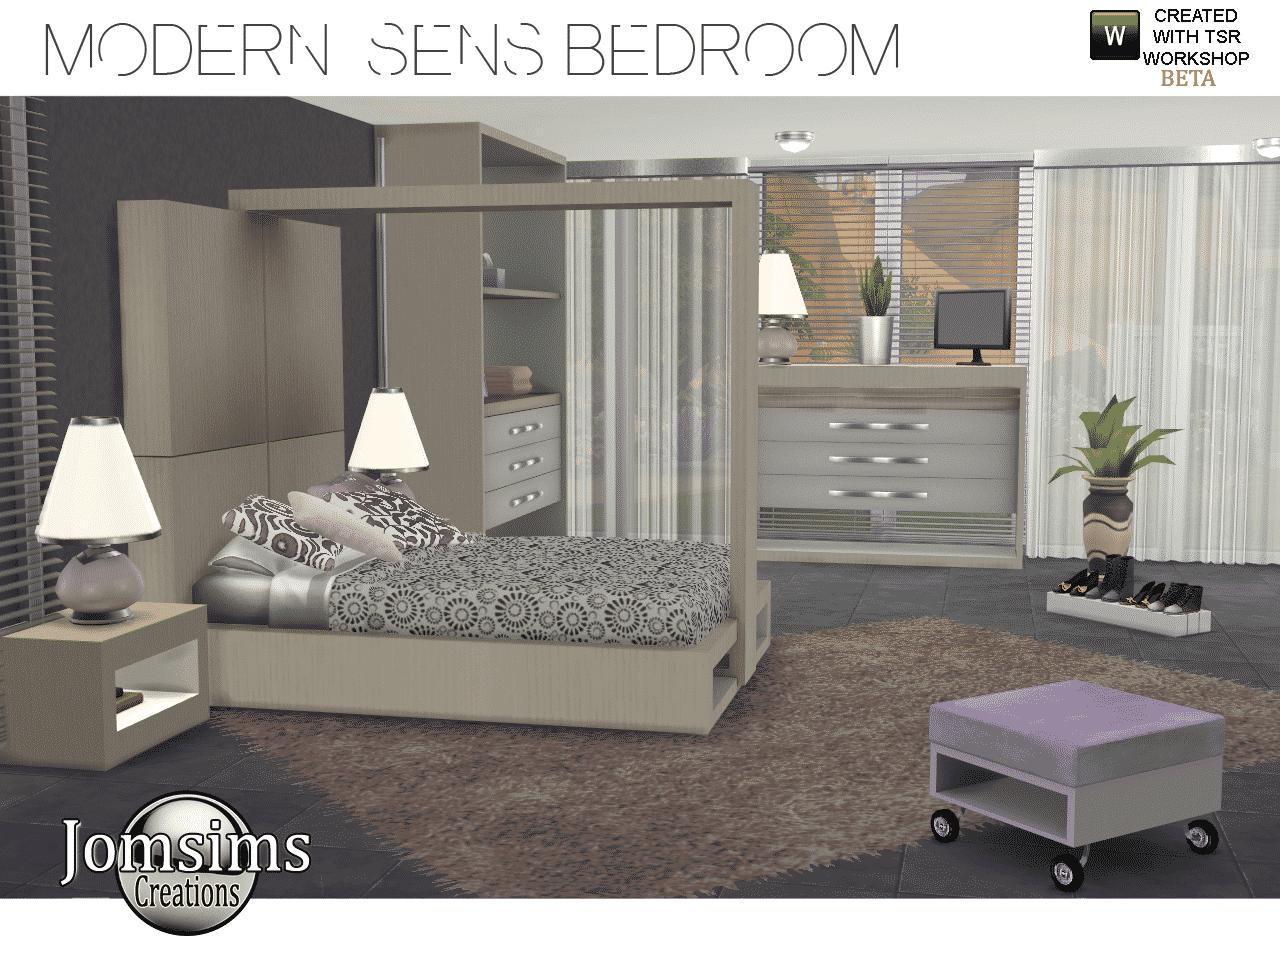 The Sims 4 Custom Content Modern Sens Bedroom